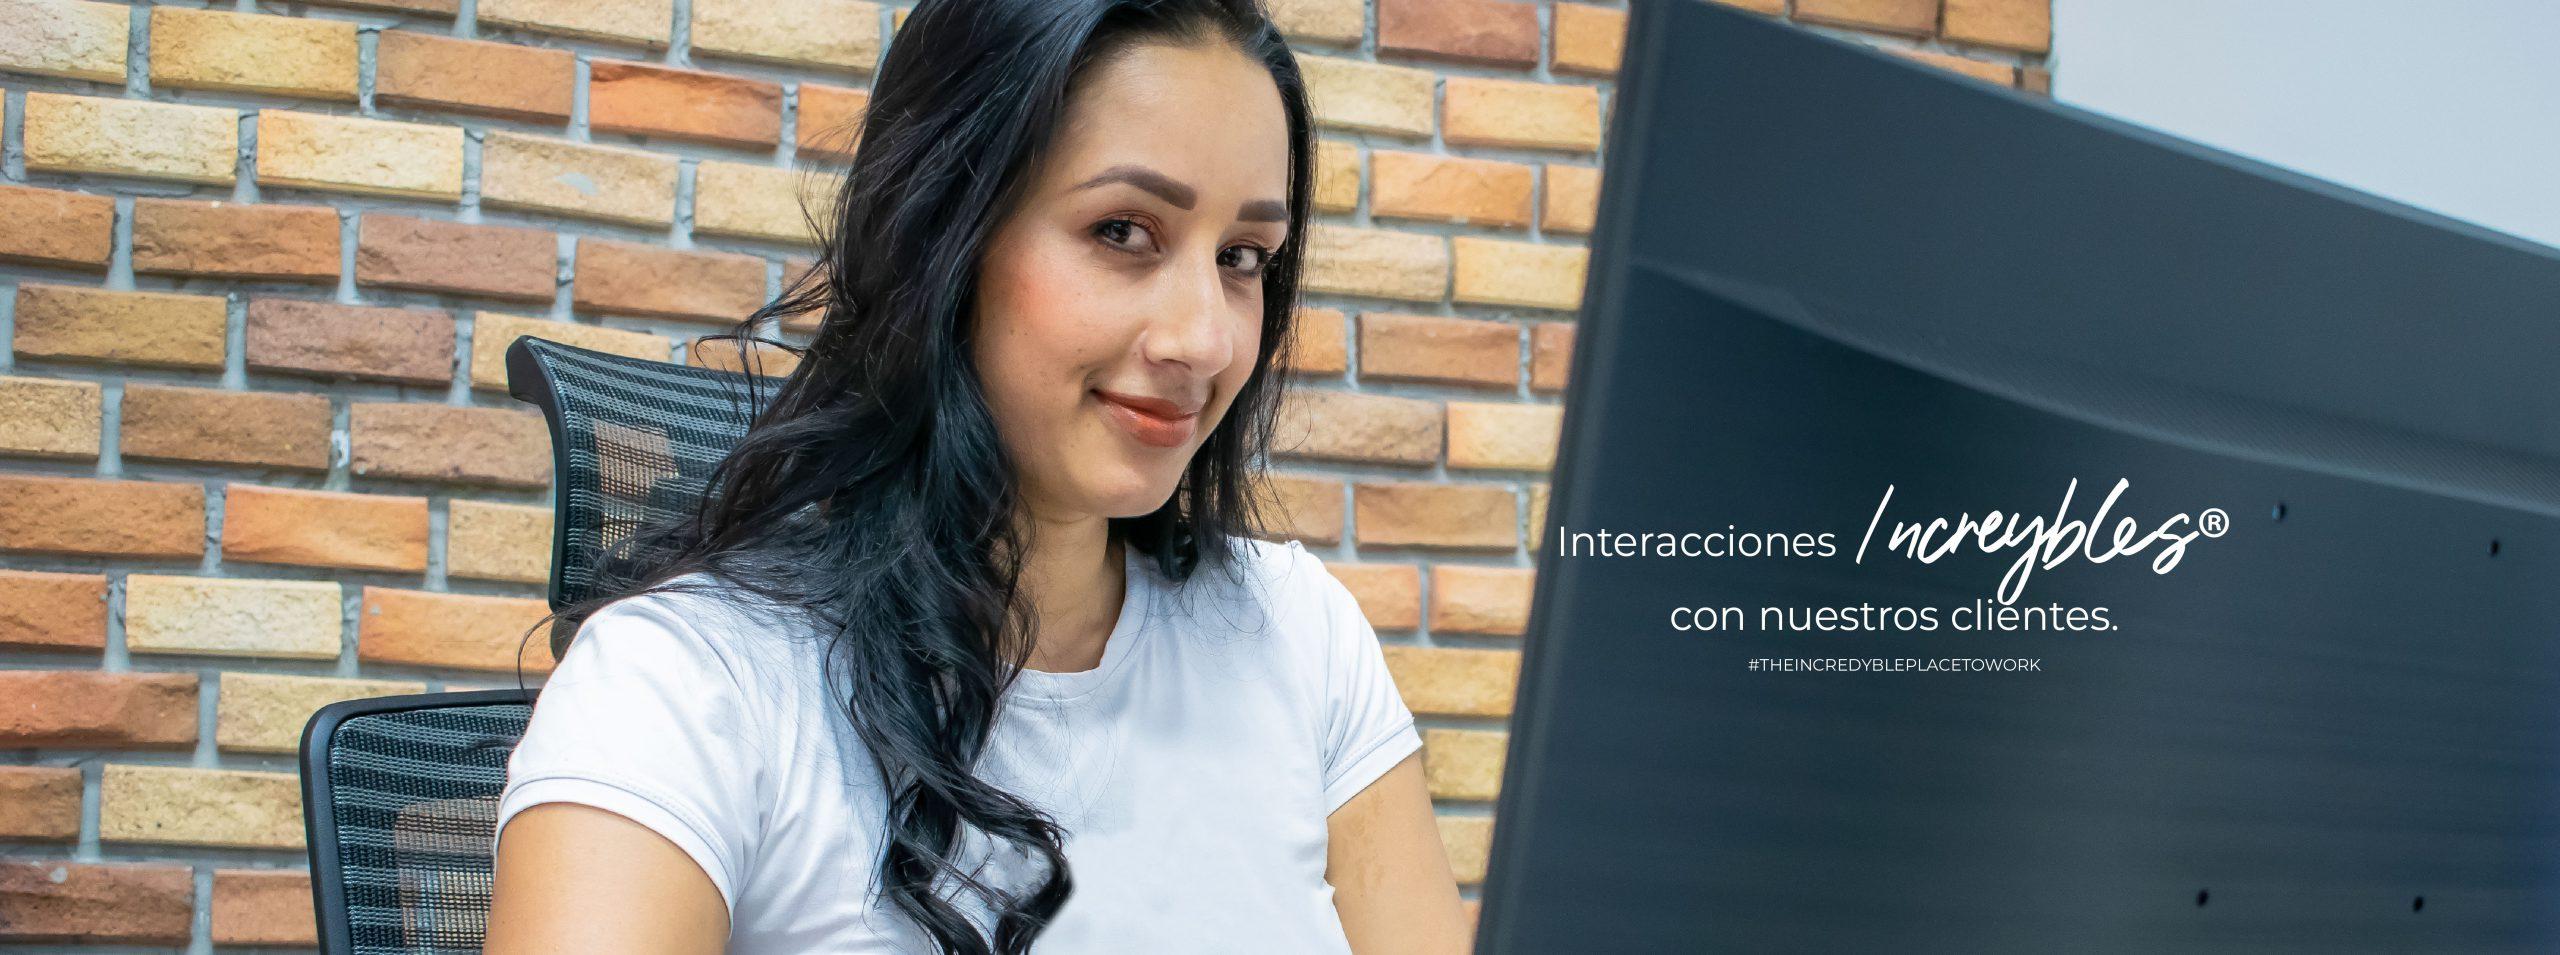 Banners_Services Español